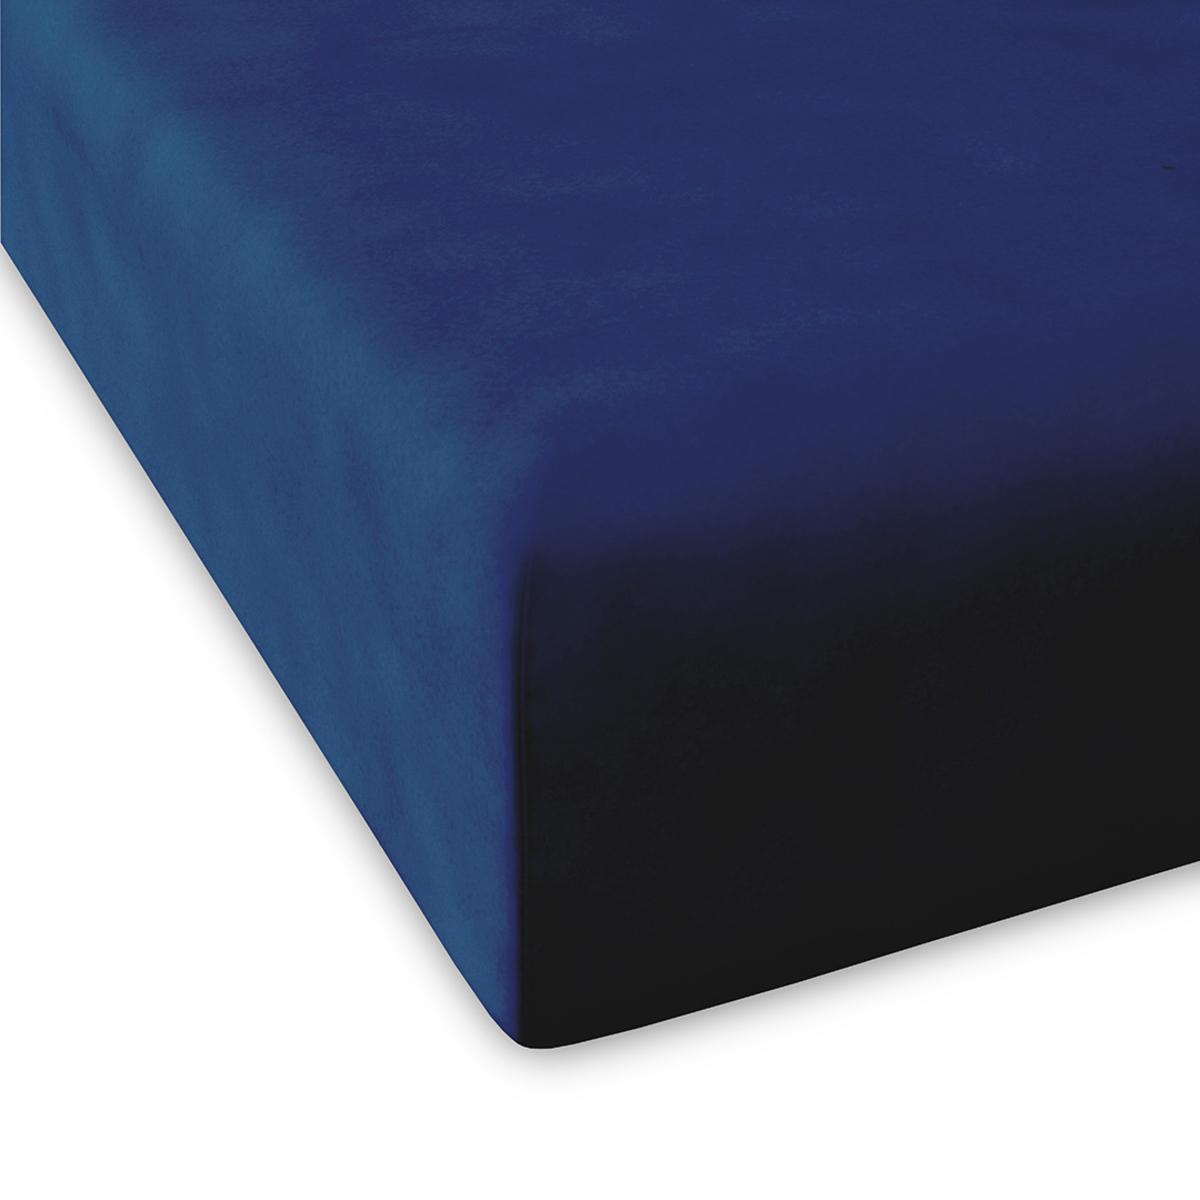 Drap housse en coton bleu marine 180x200